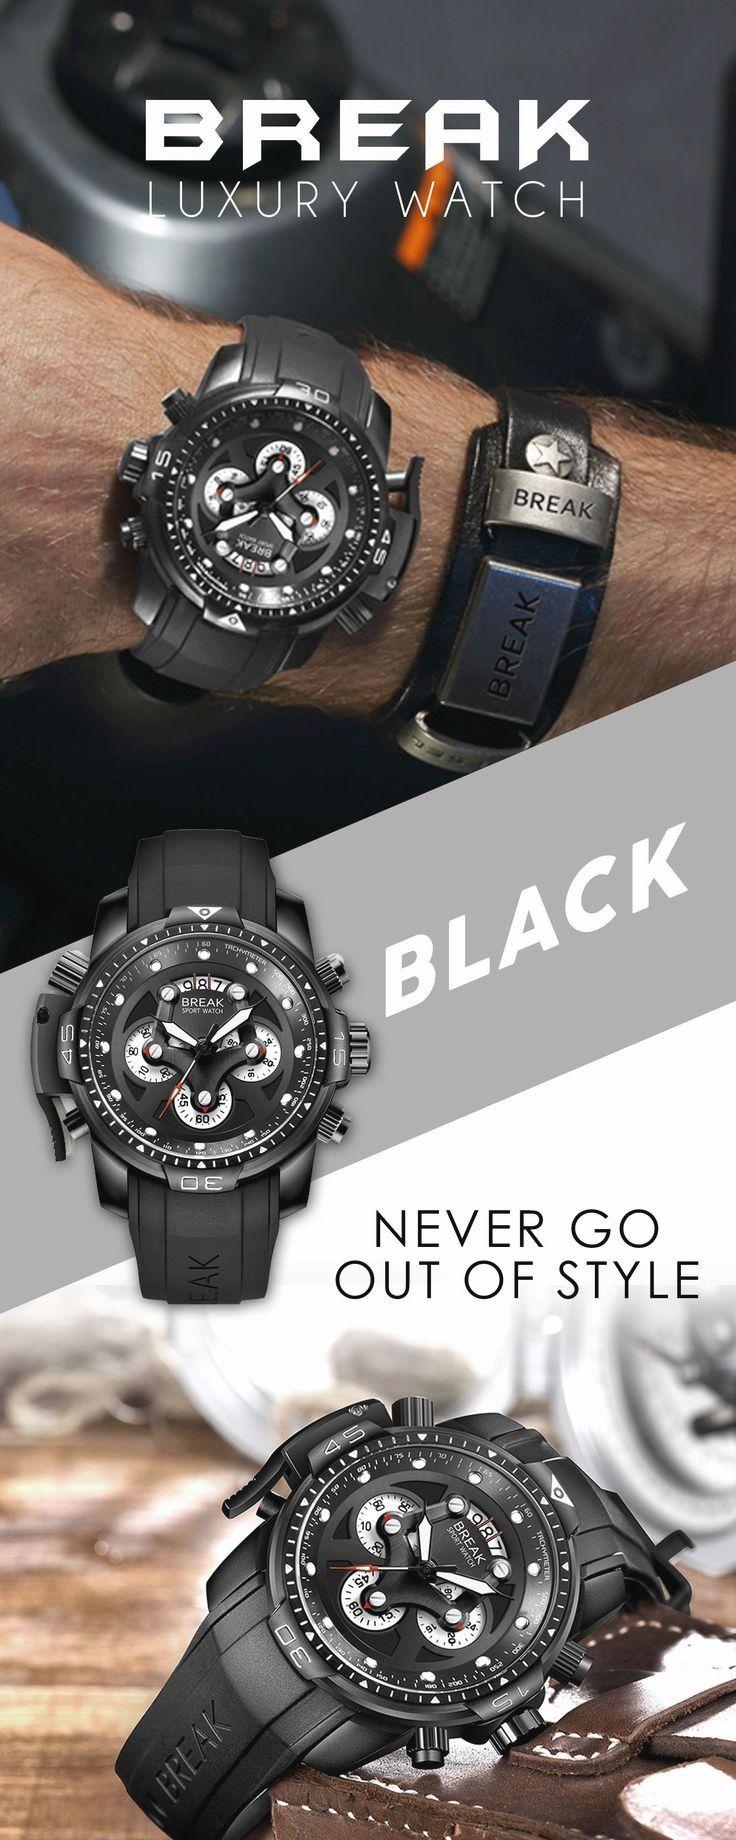 90fb4e12416 BREAK Luxury Unique Fashion Army Wrist watches for men - men s black sport waterproof  watch timepiece chronograph - men s top brand designer fashion style ...